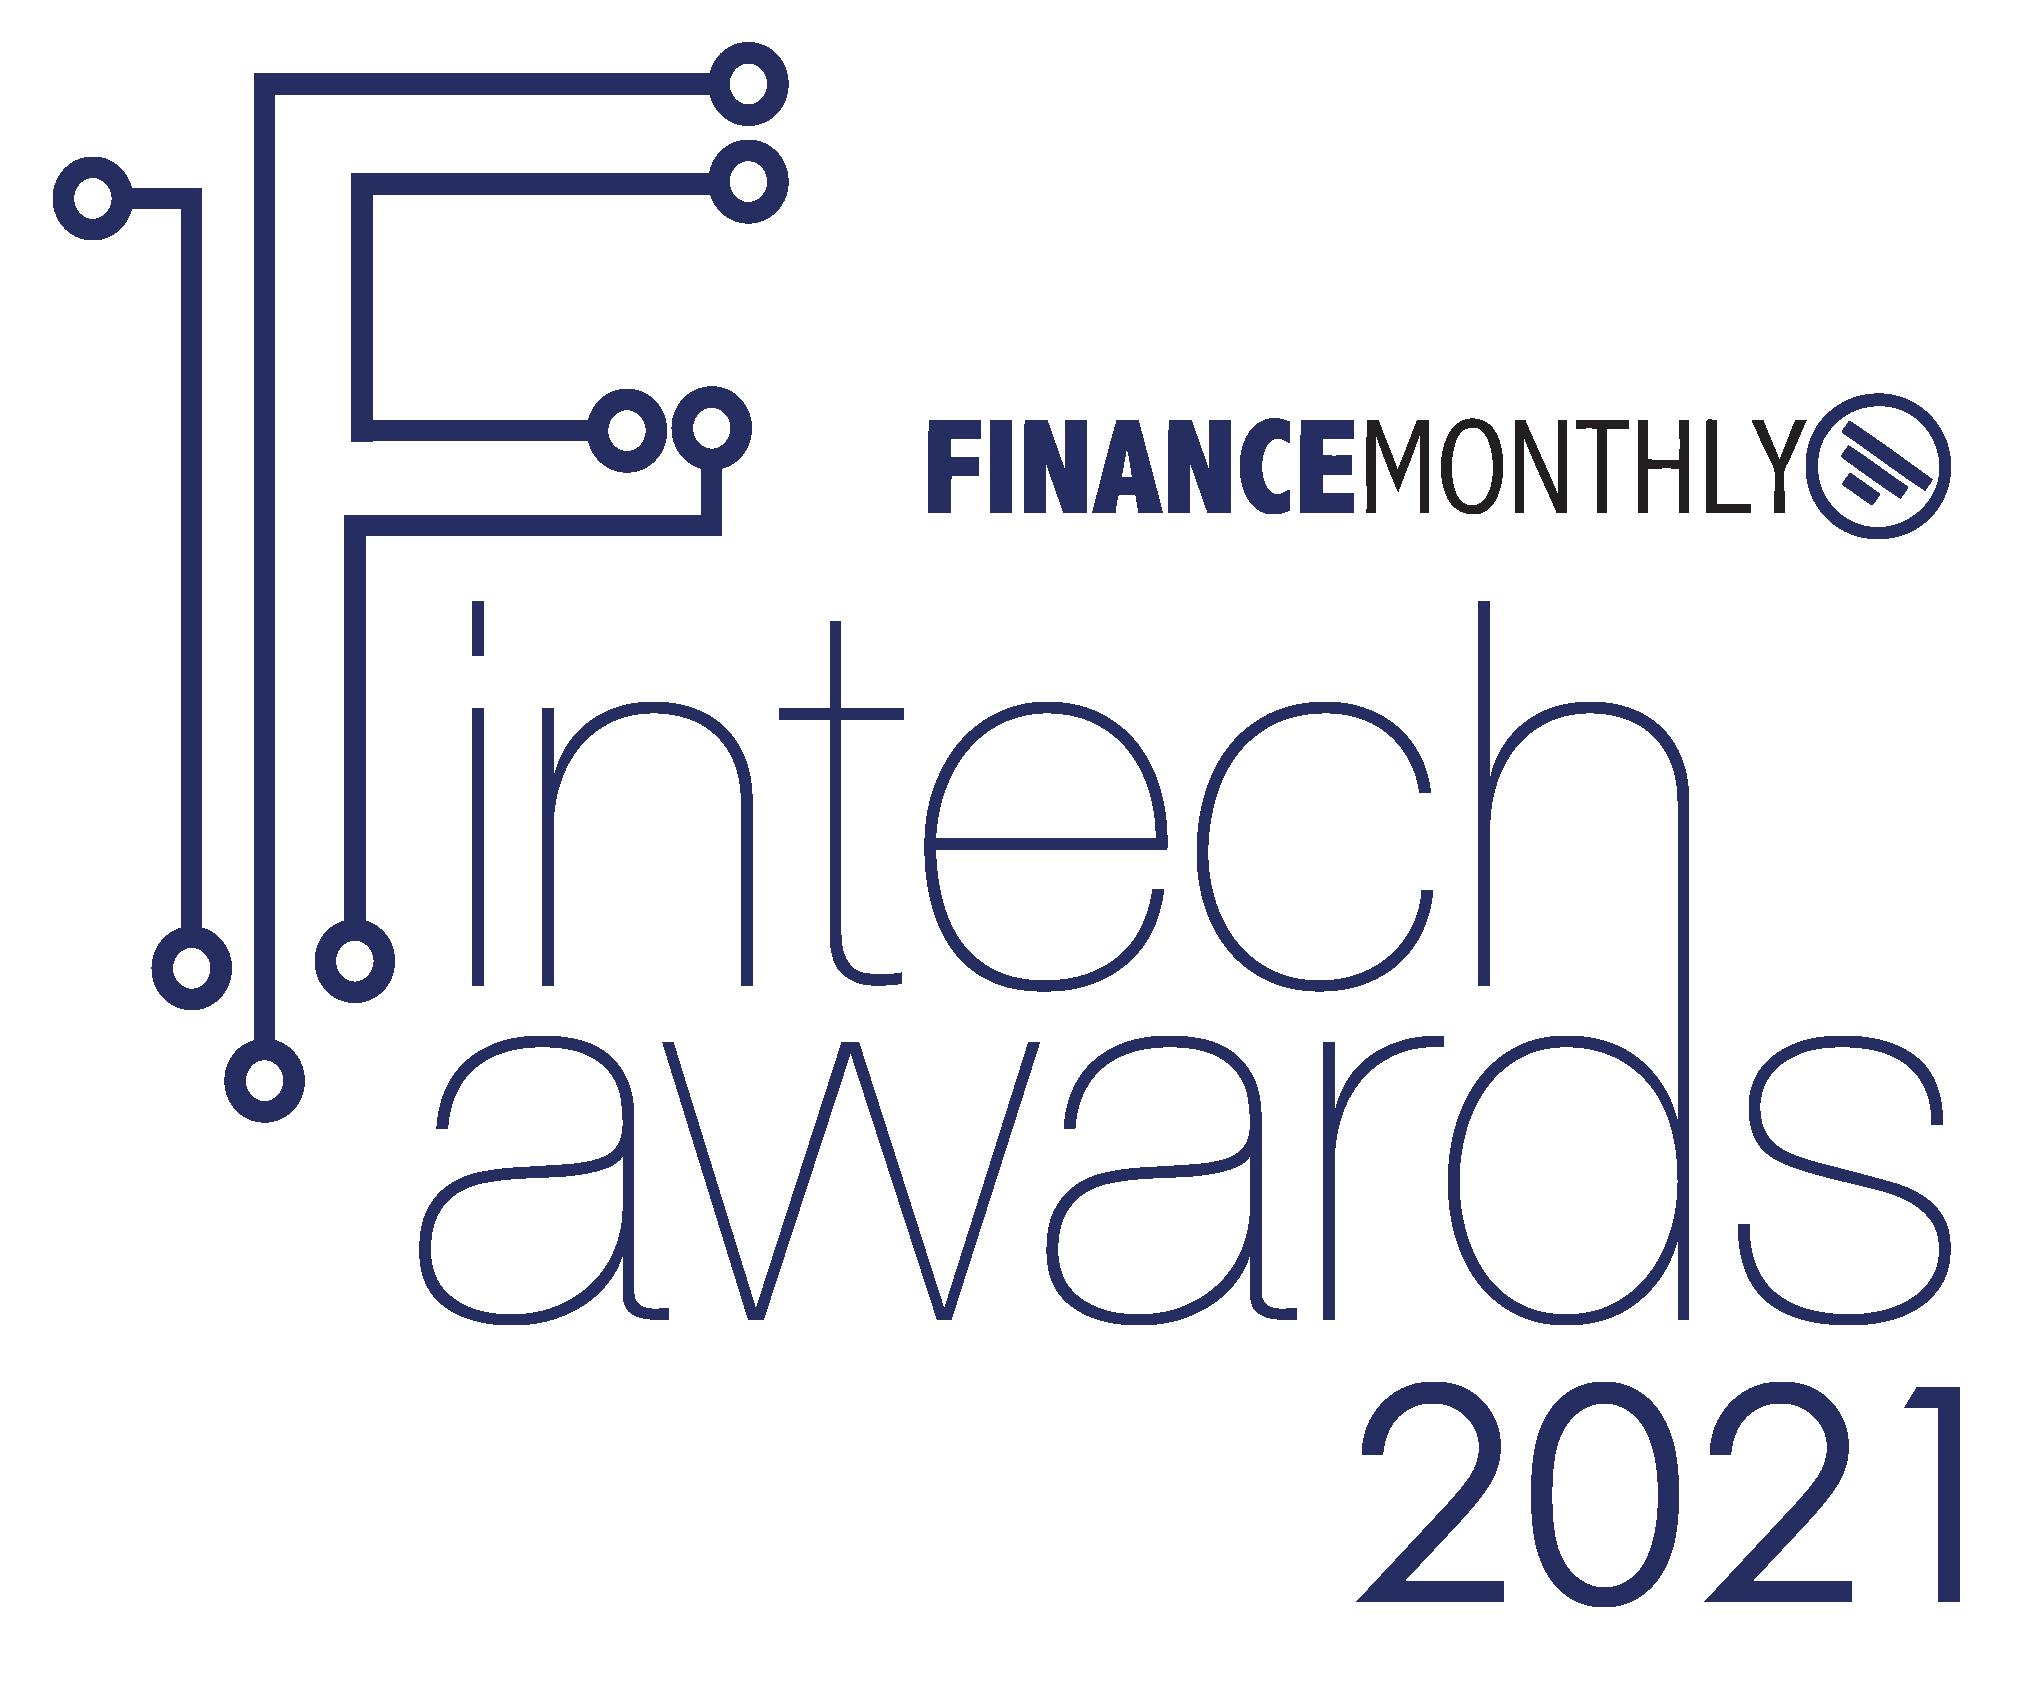 Finance Monthly Fintech Awards 2021 - Anne Boden MBE